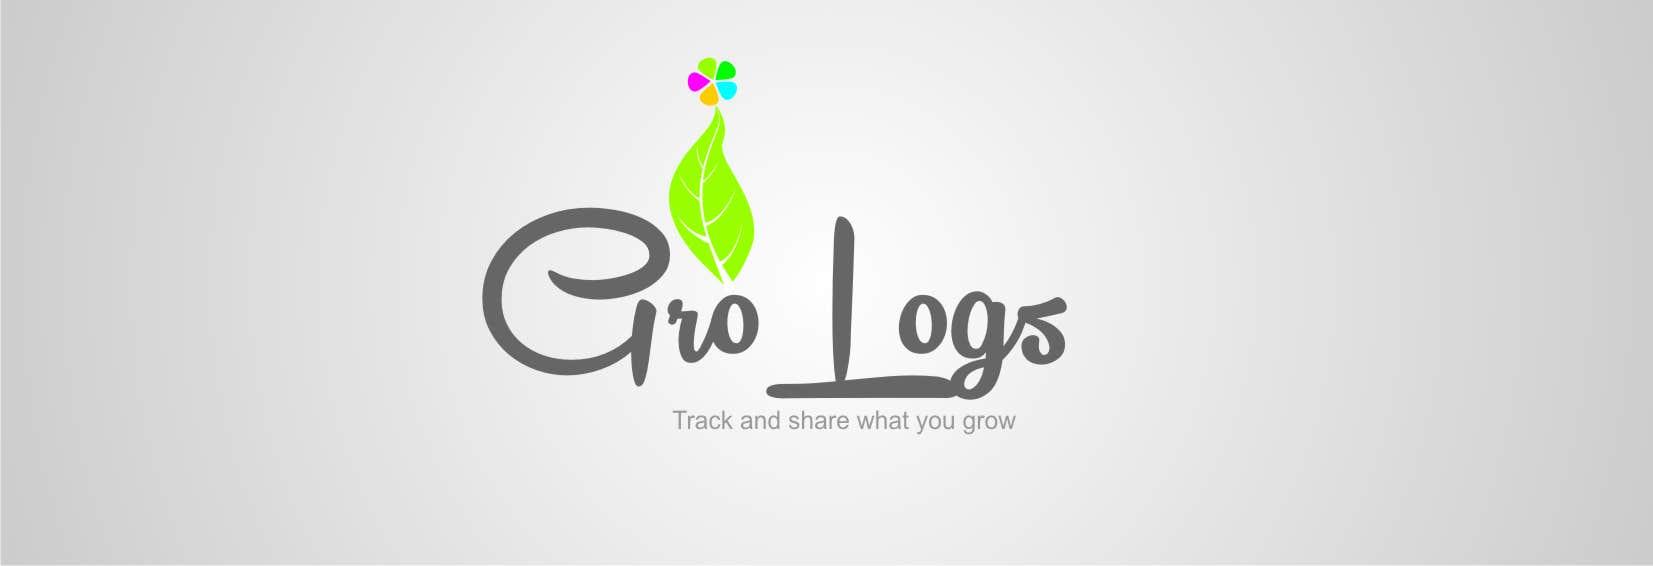 Bài tham dự cuộc thi #                                        46                                      cho                                         Design Logo & Icon for GroLogs